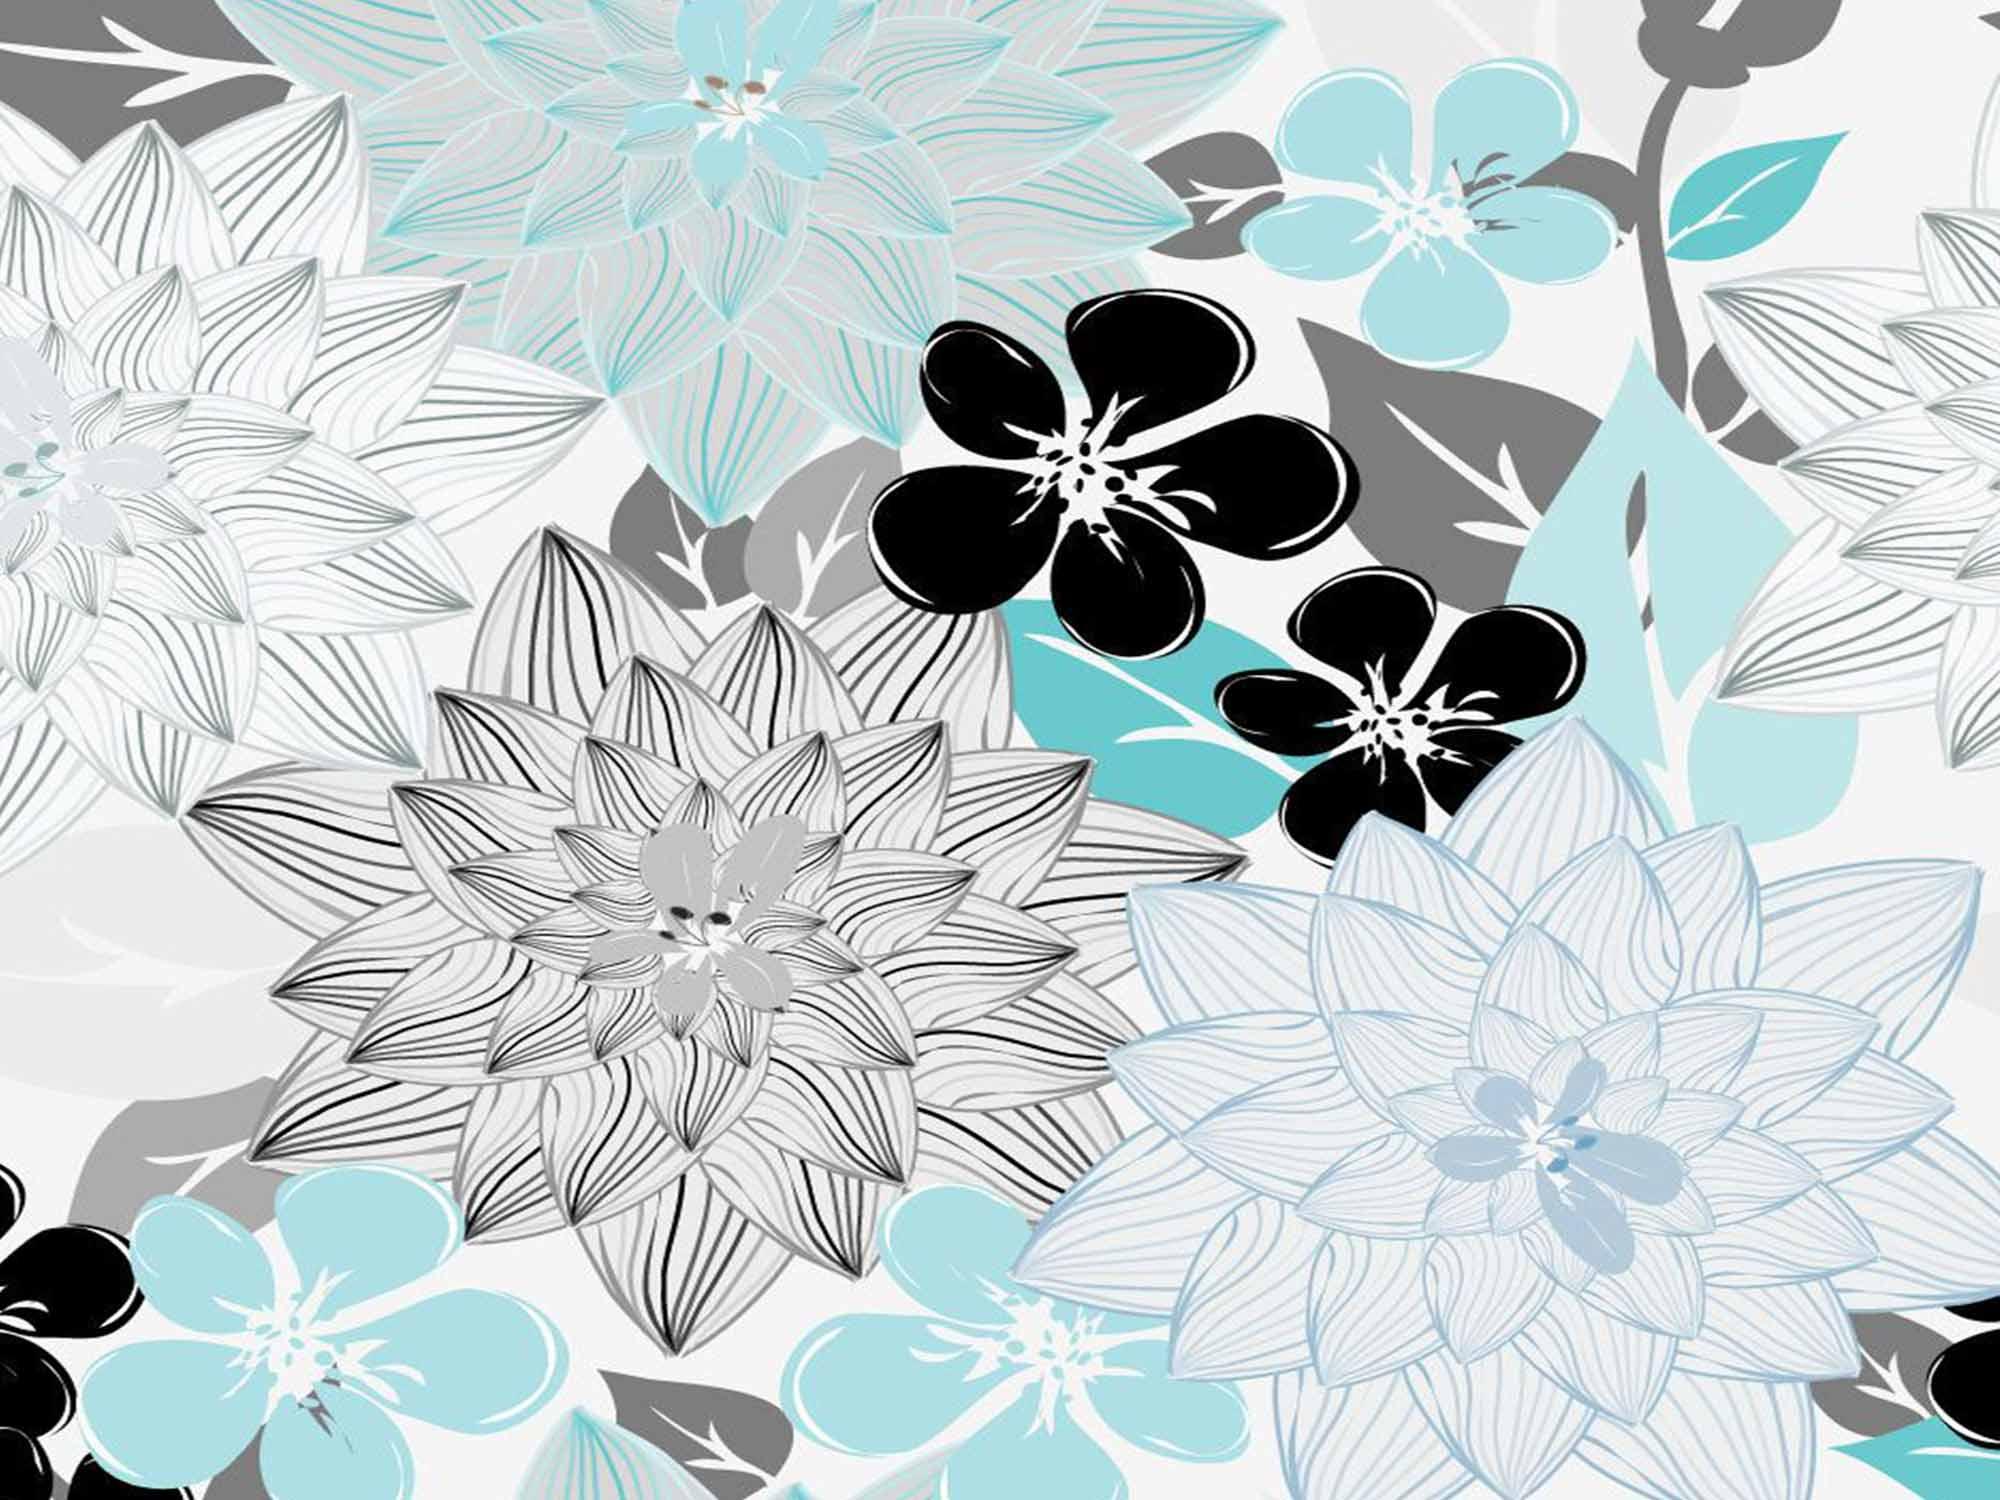 Papel de Parede Floral 0095 - Adesivos de Parede  - Paredes Decoradas